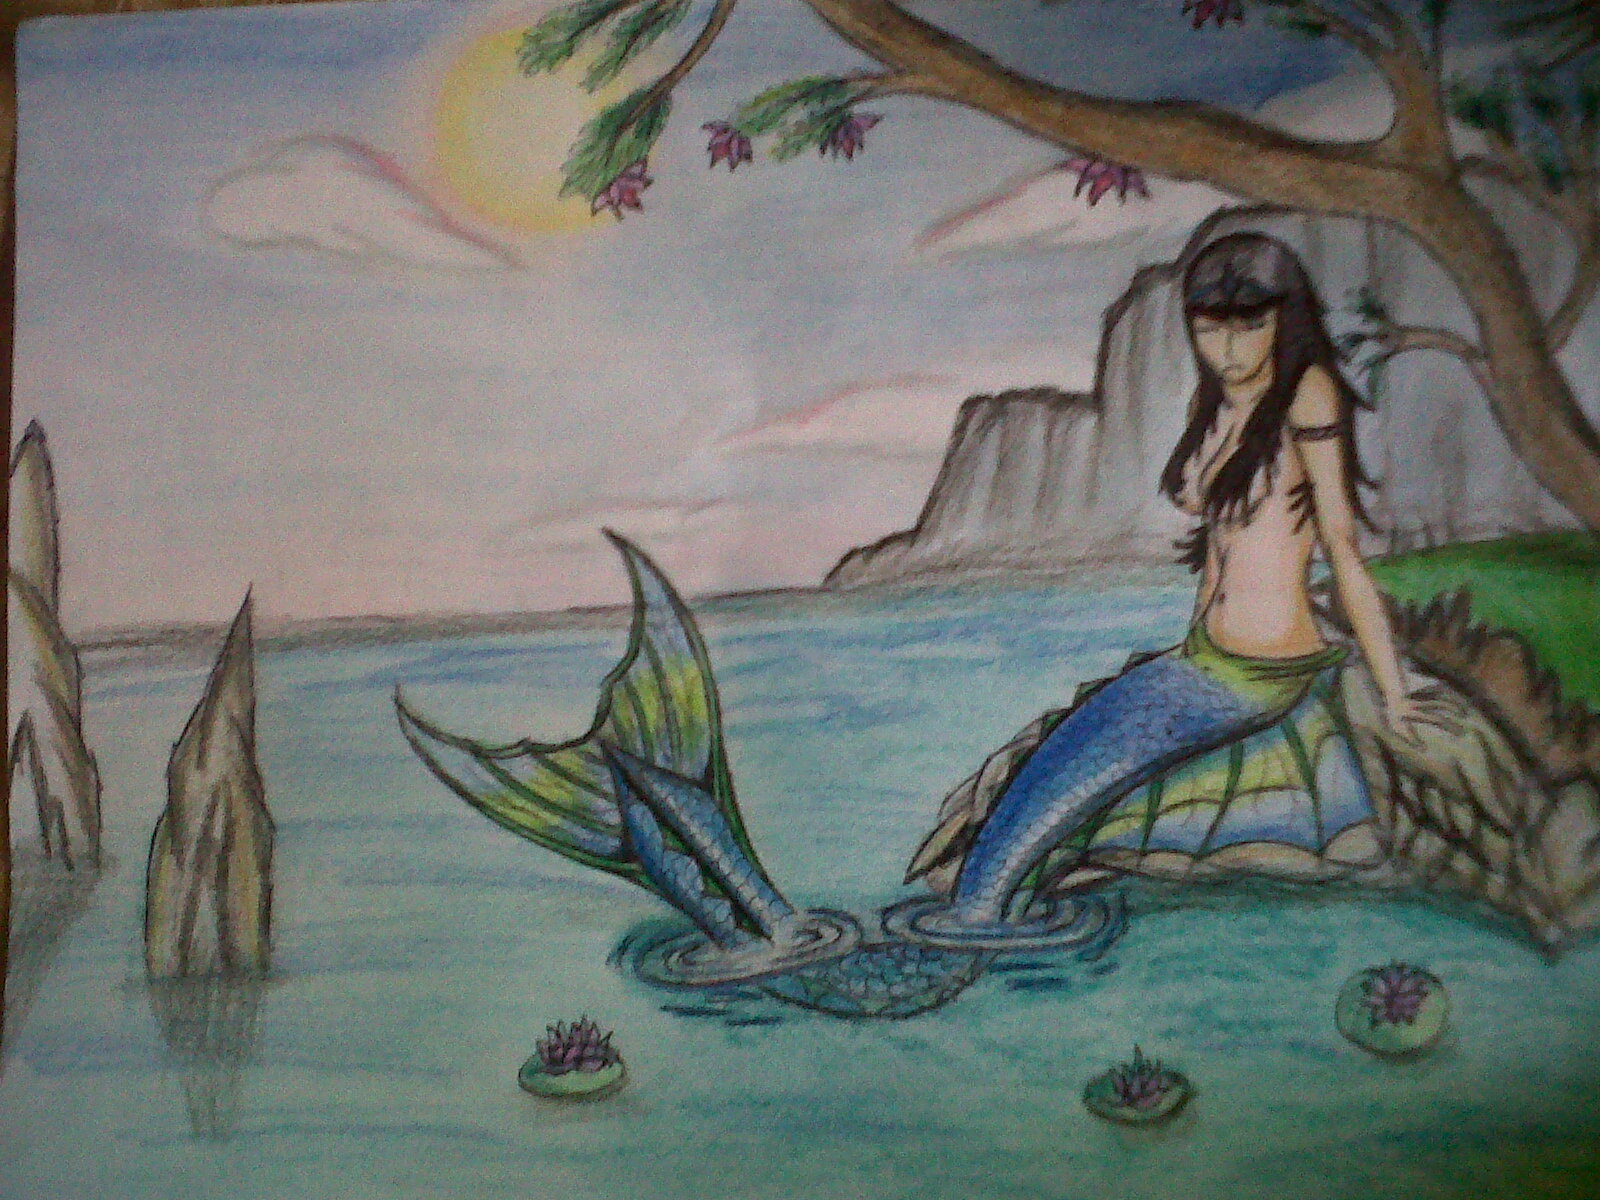 Paisaje lapiz color clipart png transparent library Dibujo: Creando una sirena - Taringa! png transparent library